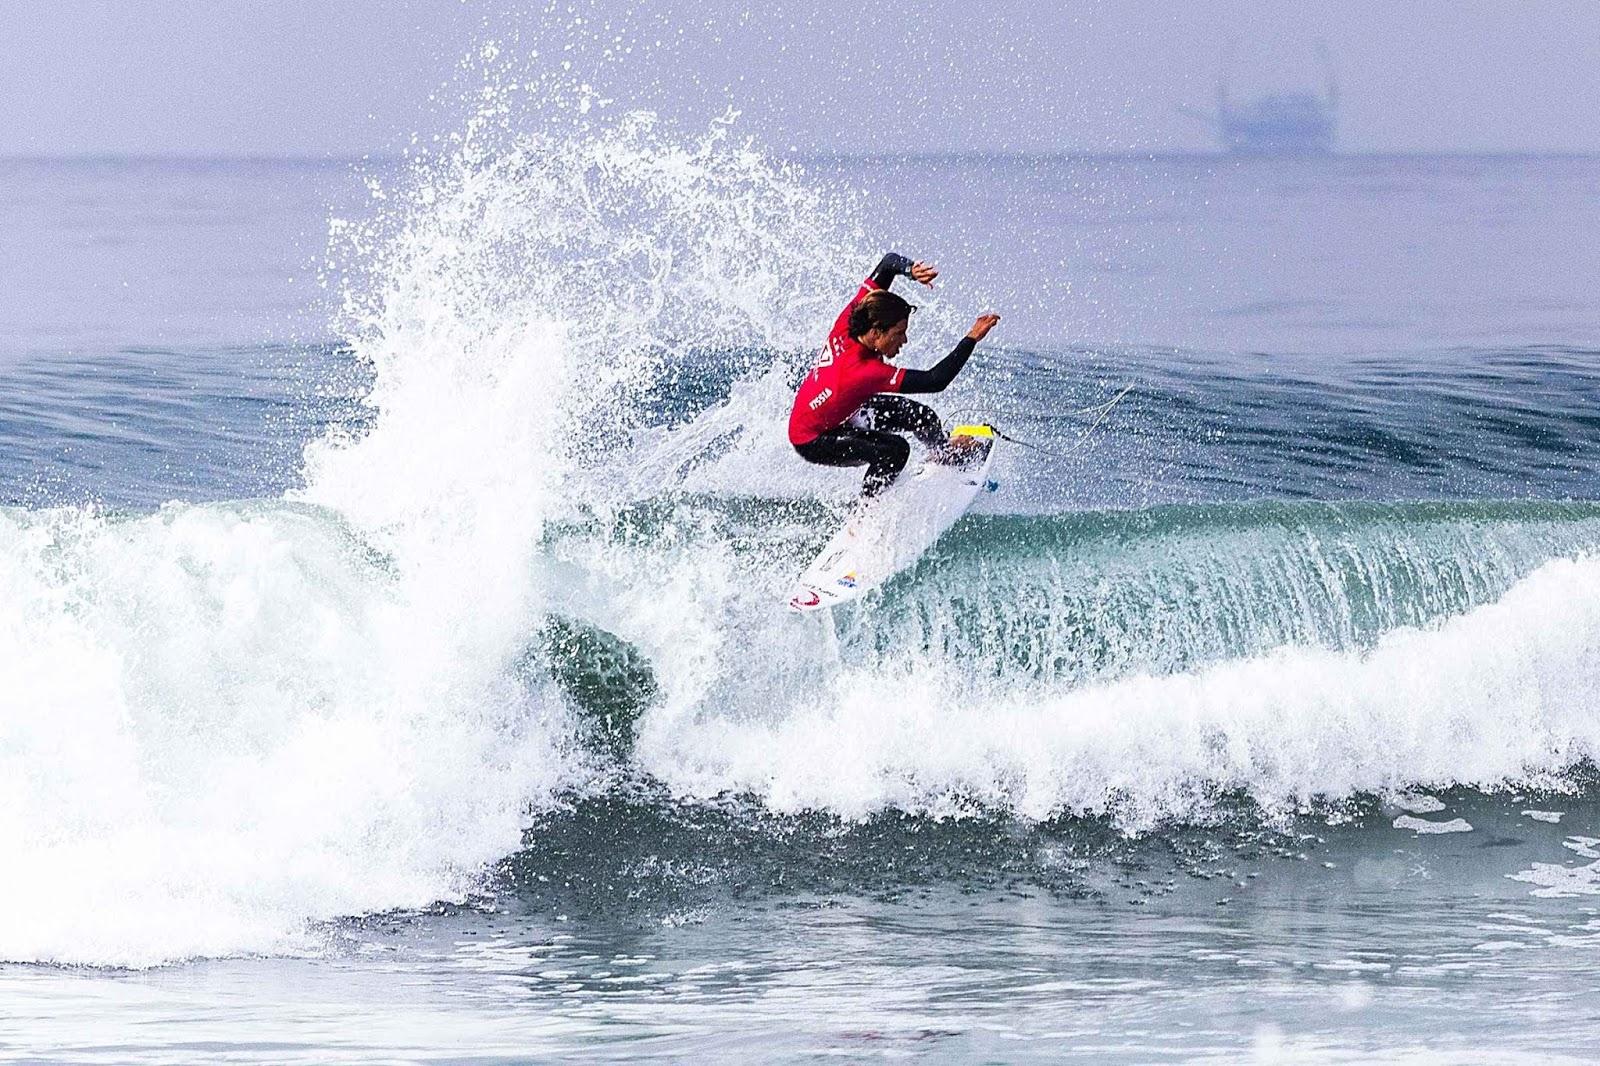 seleccion espanola de surf